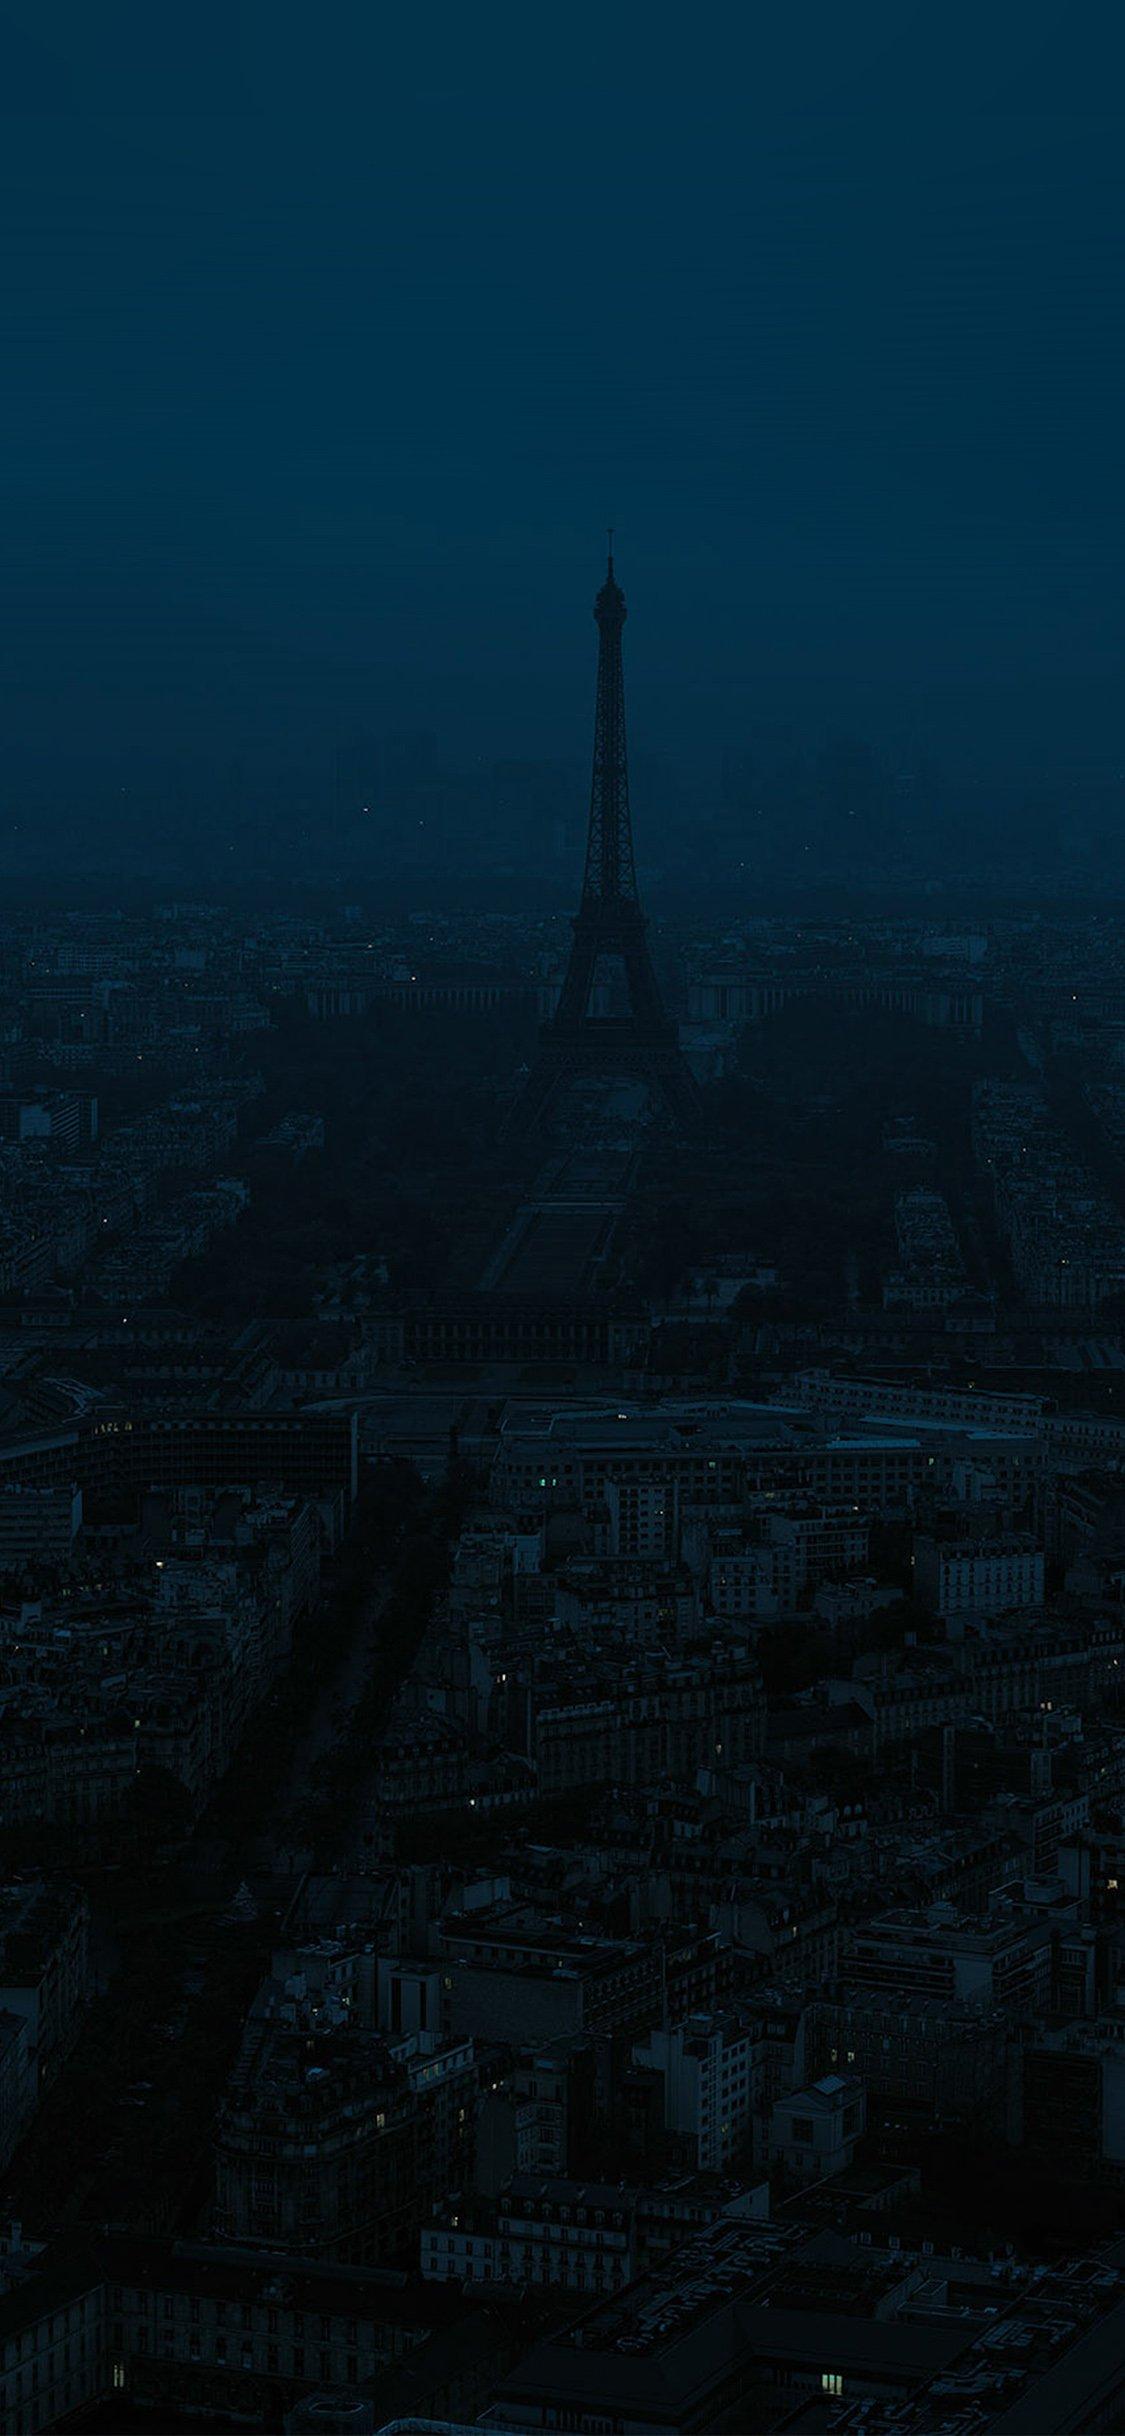 Paris Dark Blue City Iphone X Wallpapers Free Download